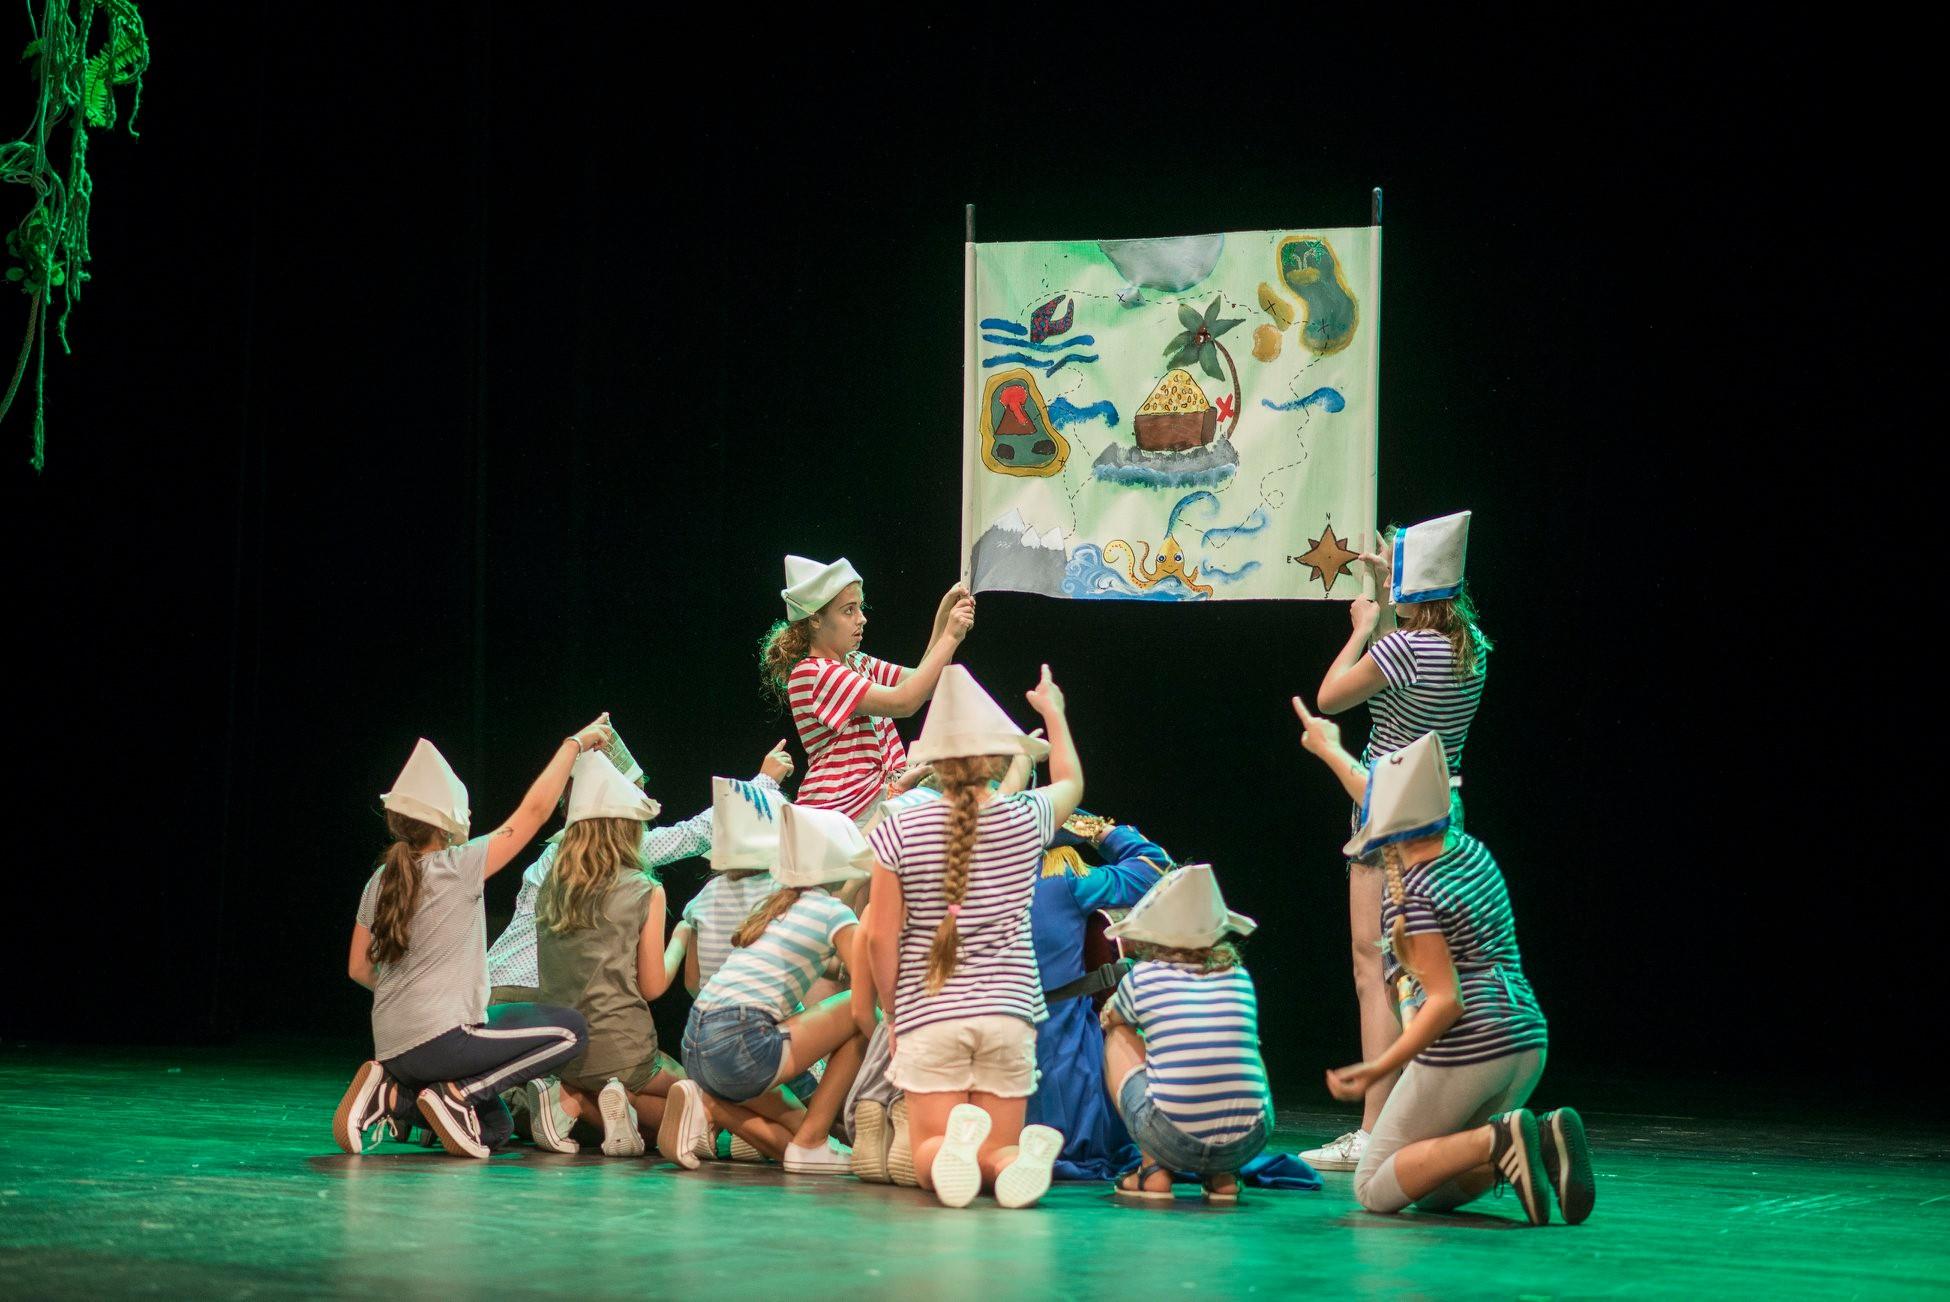 djp, deti, divadlo, kultúra, predstavenie